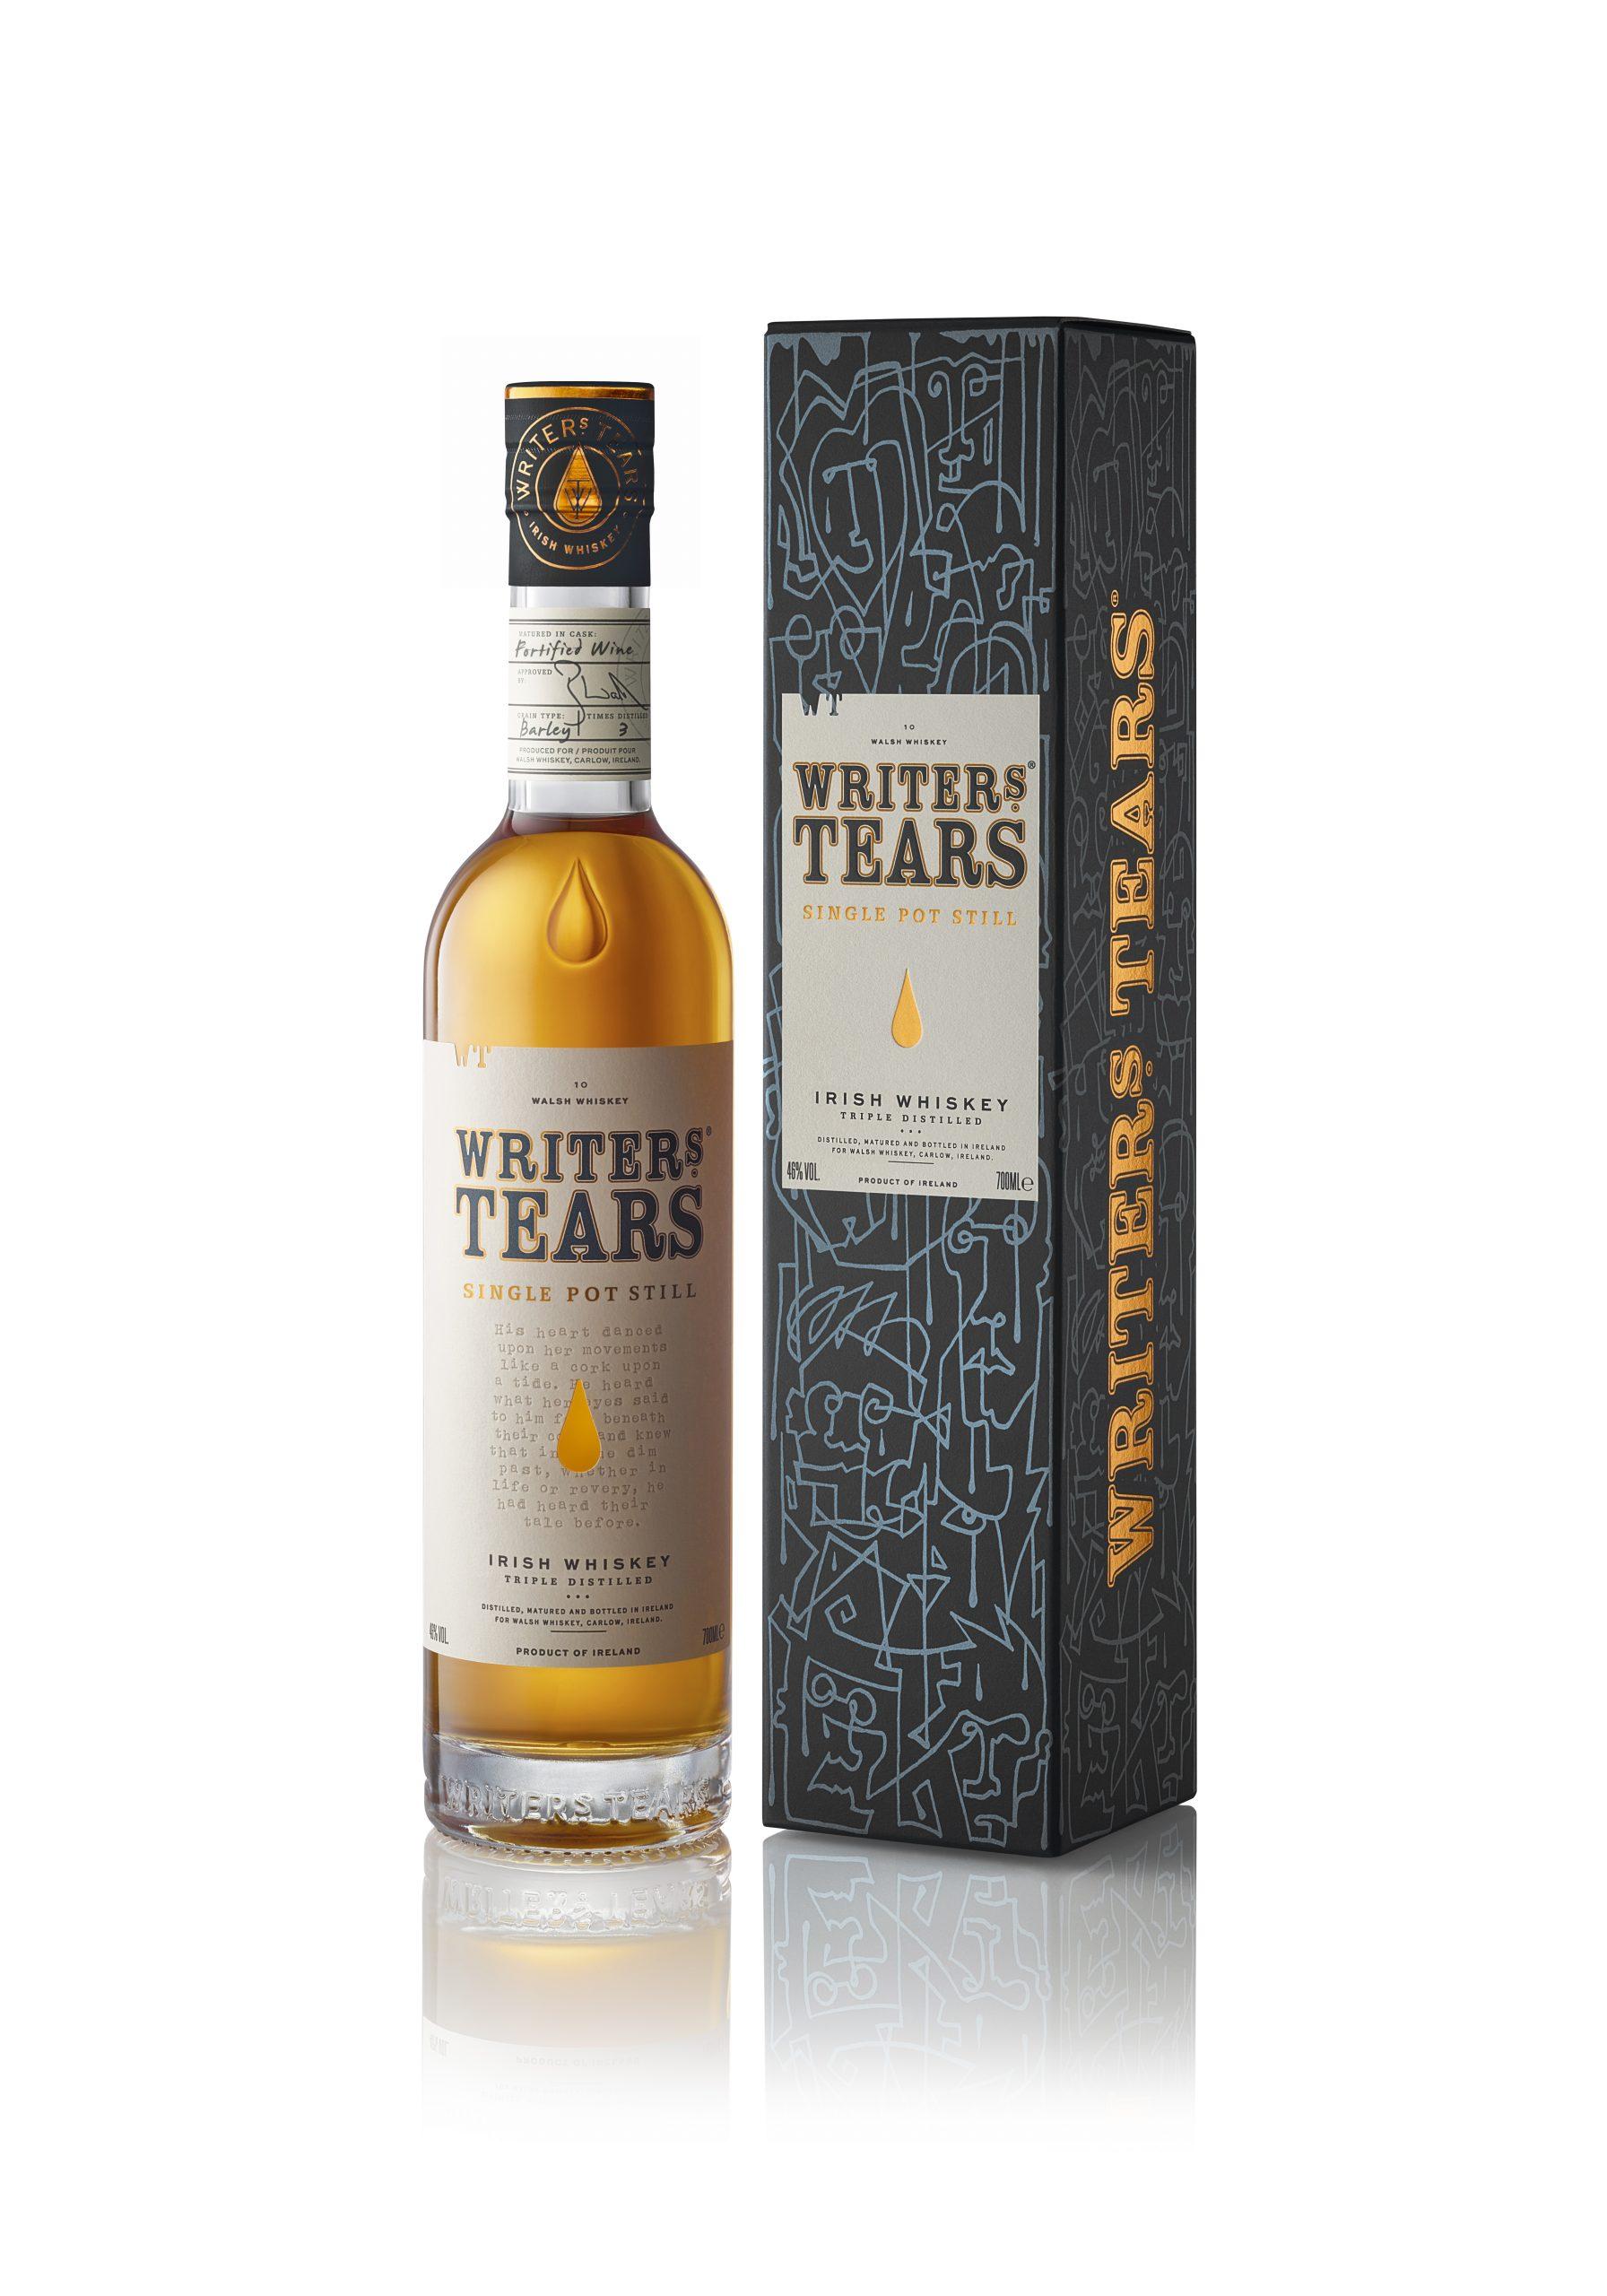 Writers Tears Single Pot Still Pedro Ximenez Marsala Cask Irish Whiskey Blogger Stuart Mcnamara